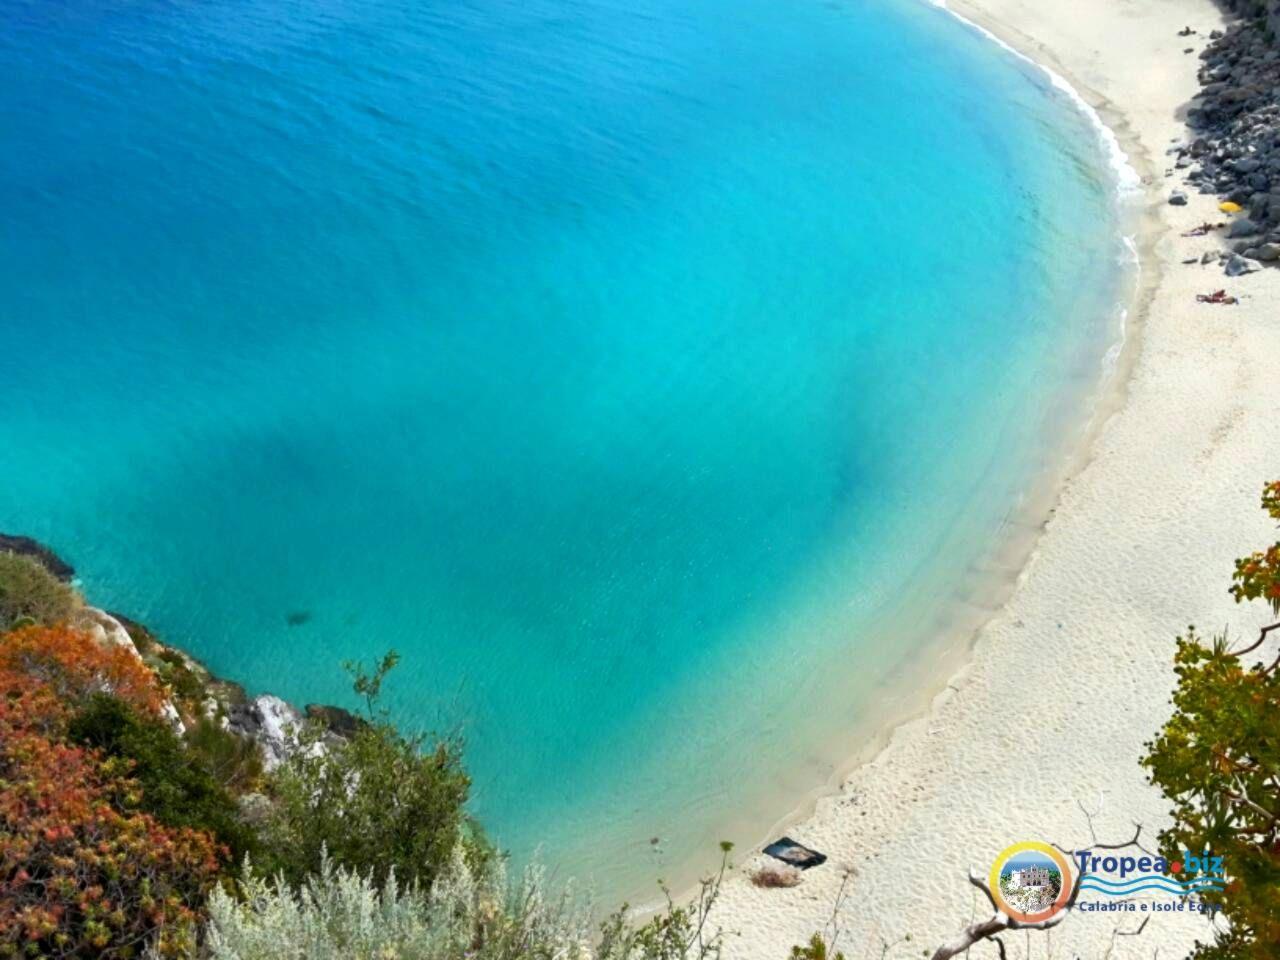 Vacanze Last Minute Calabria | Offerte lastminute 2019 ...